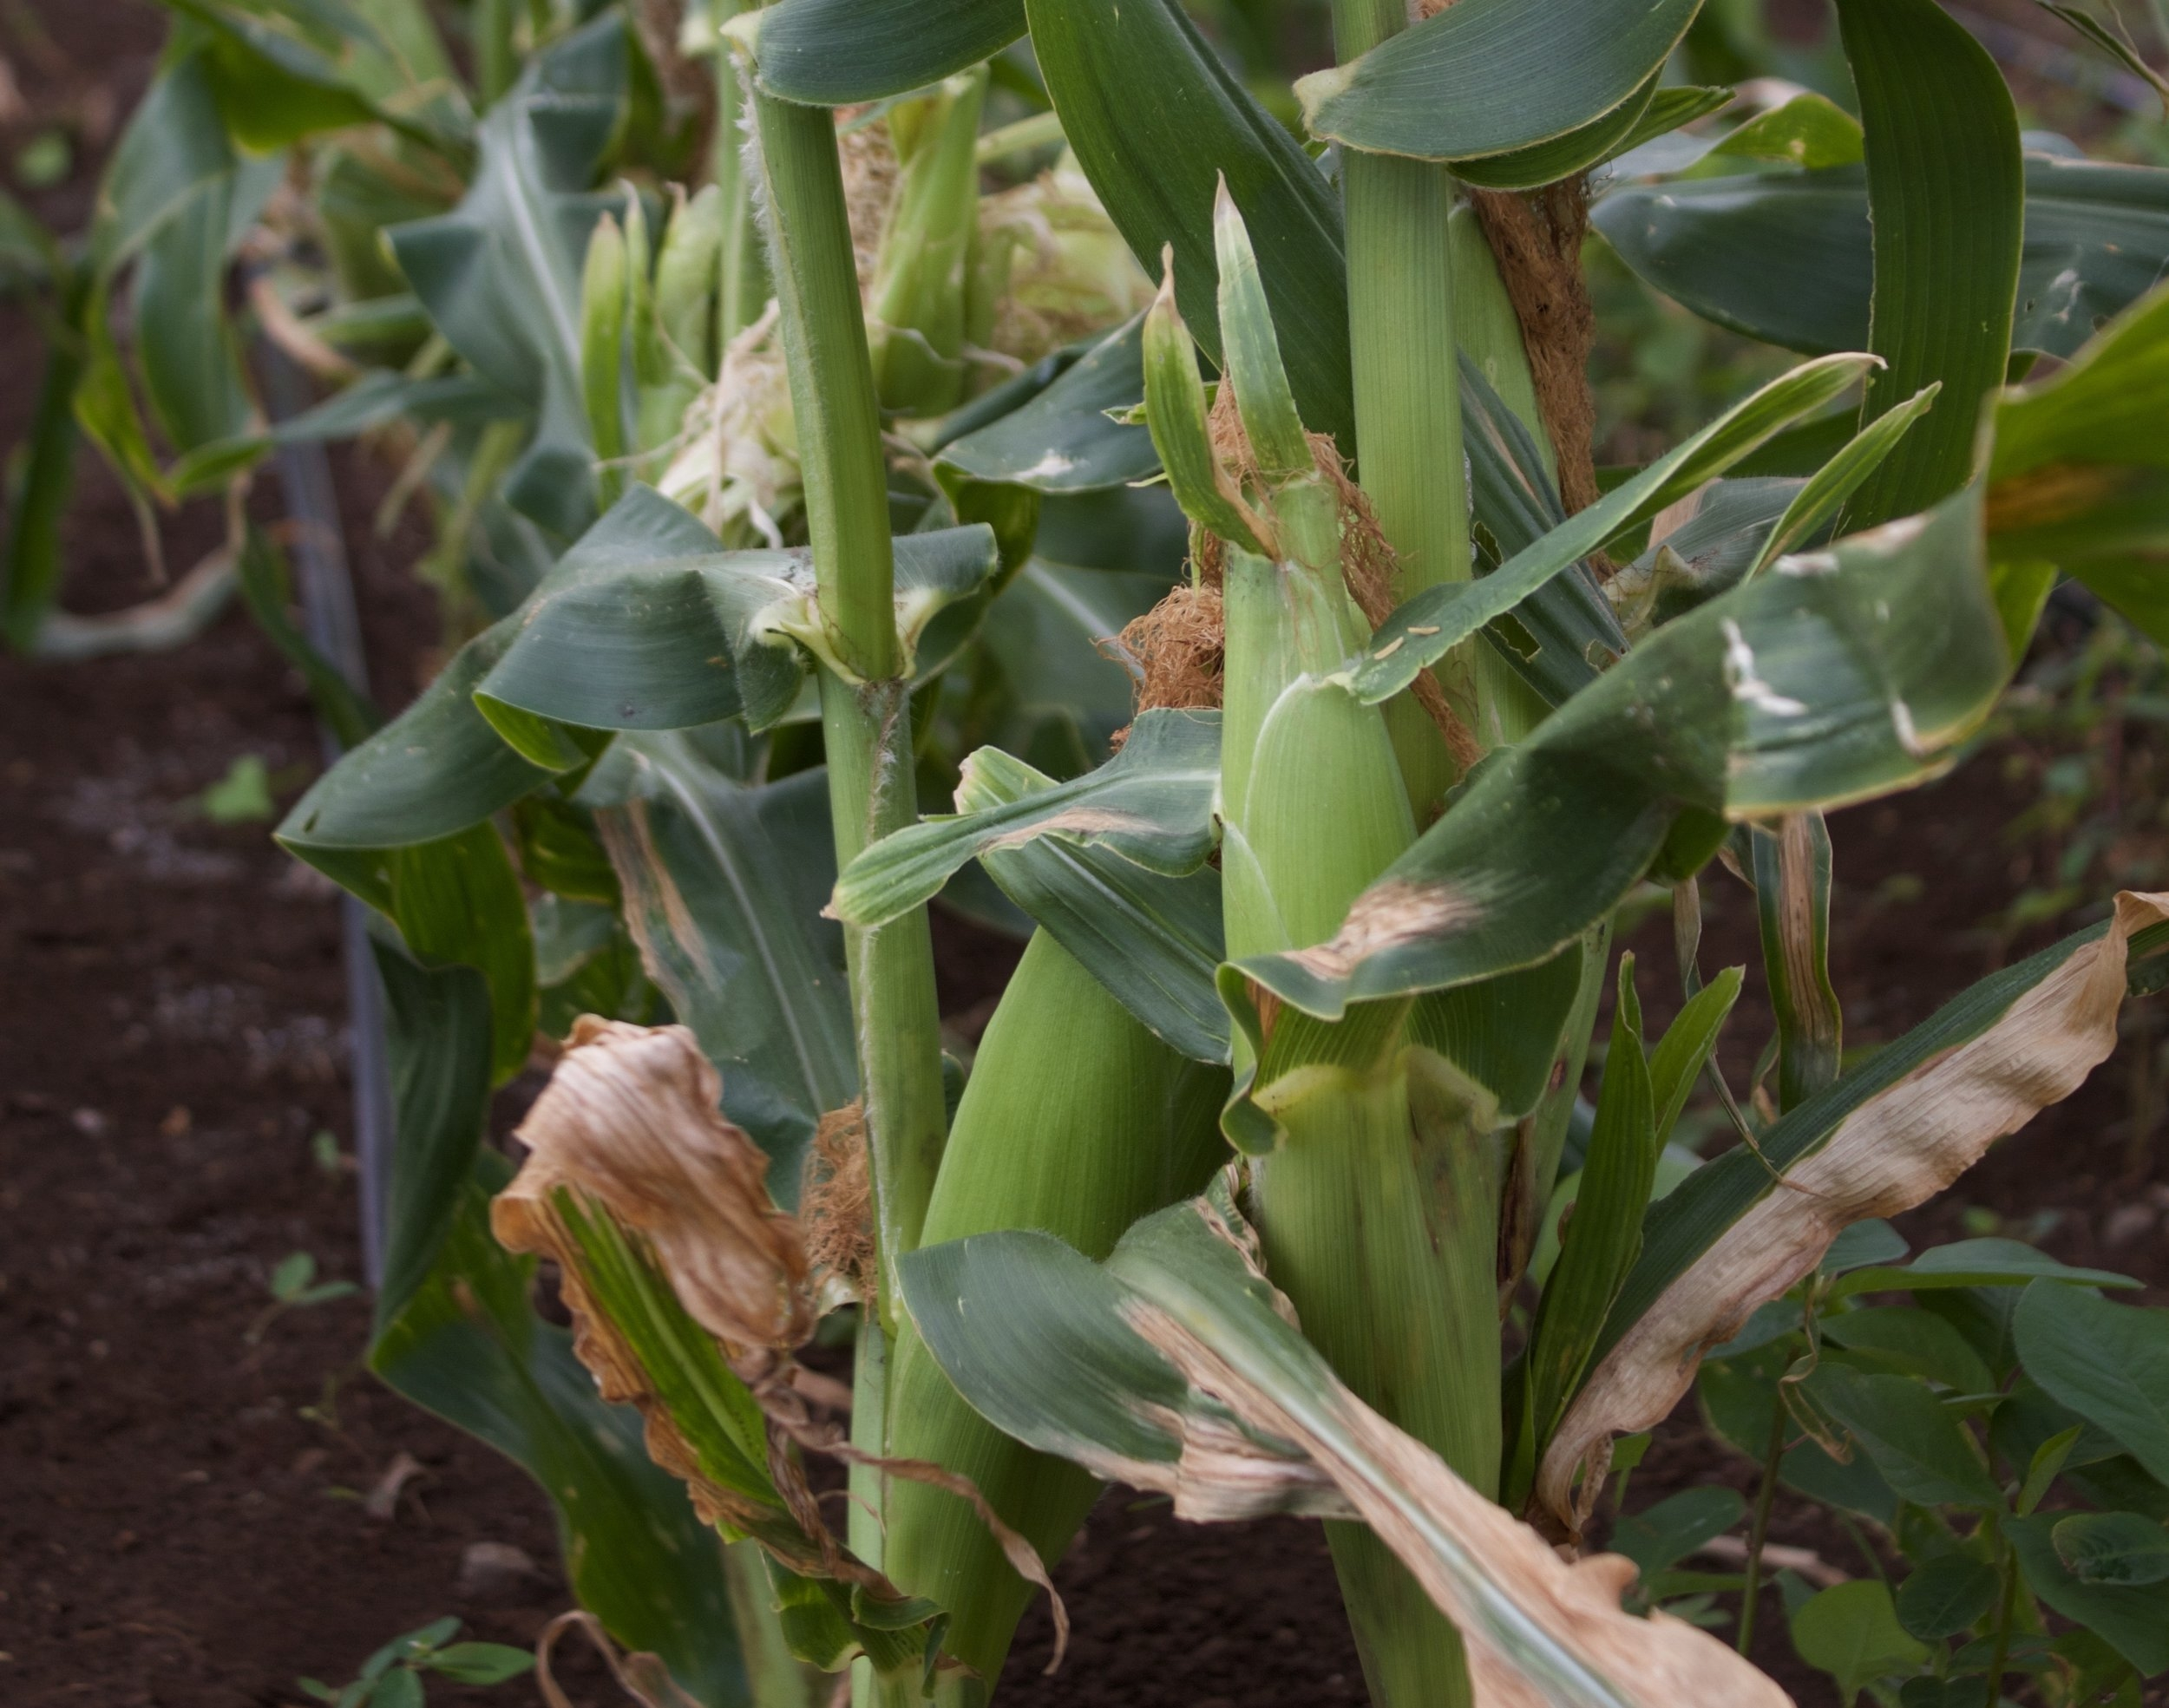 Dakota Super Sweet Corn - Non-GMO & always picked fresh